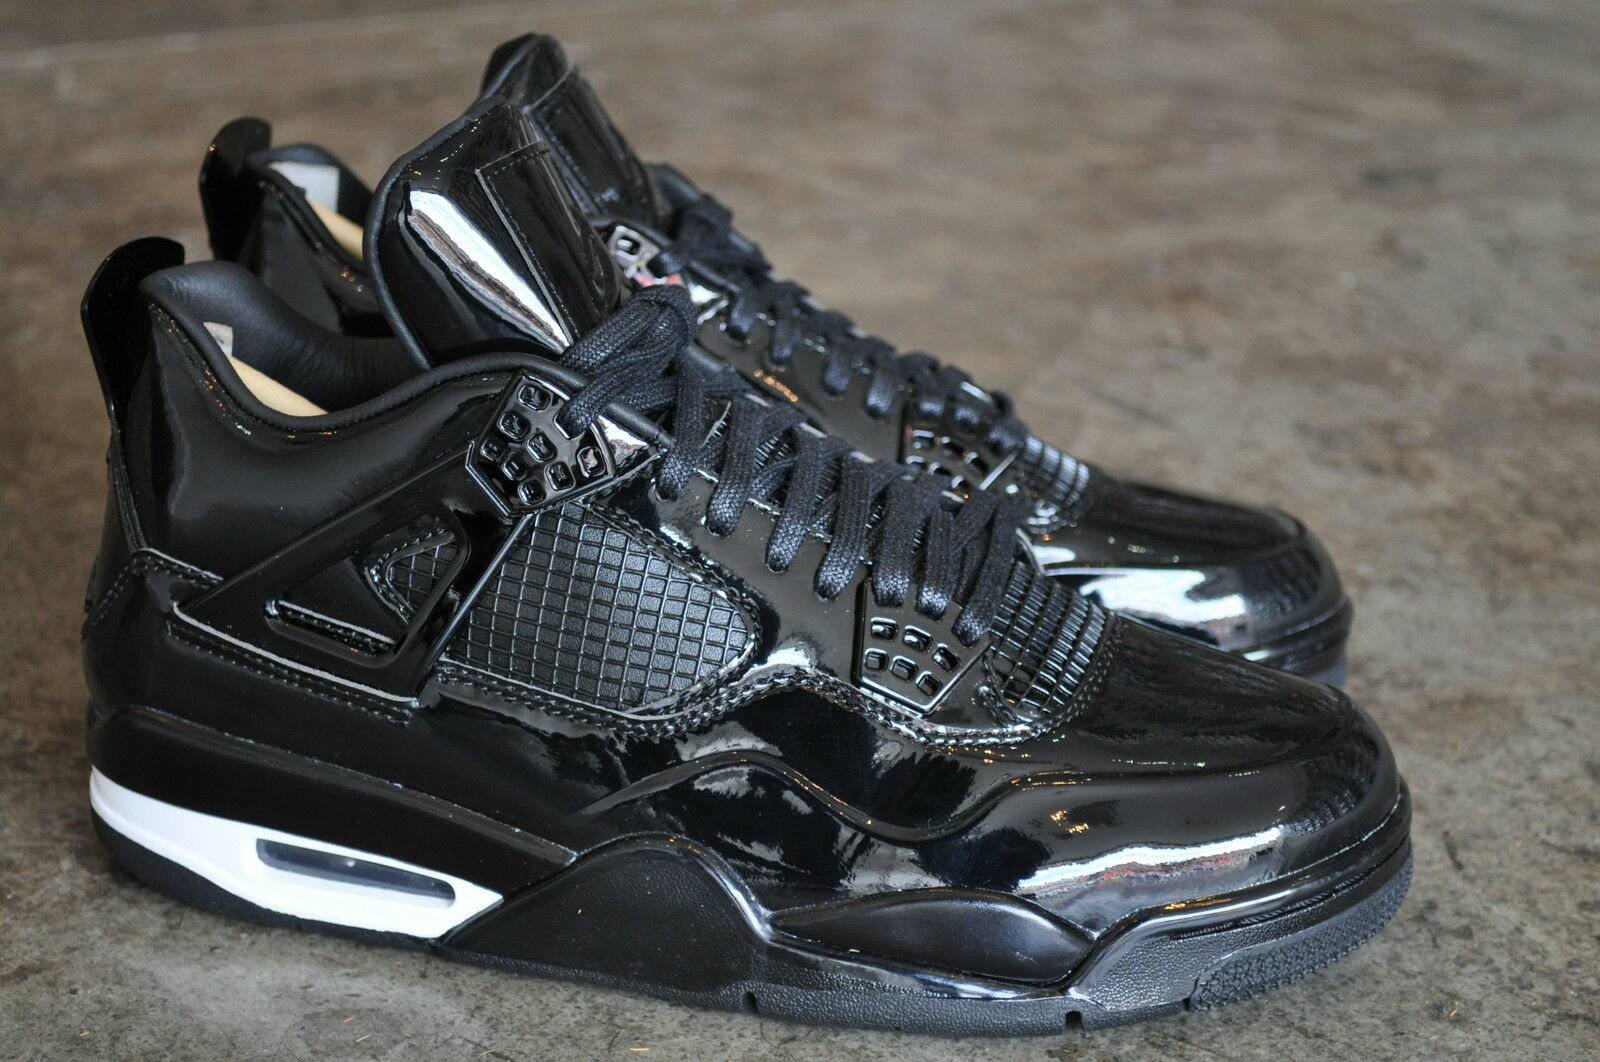 Nike 2018 Air Jordan 11LAB4 noir 2018 Nike - noir/blanc 93aa2e